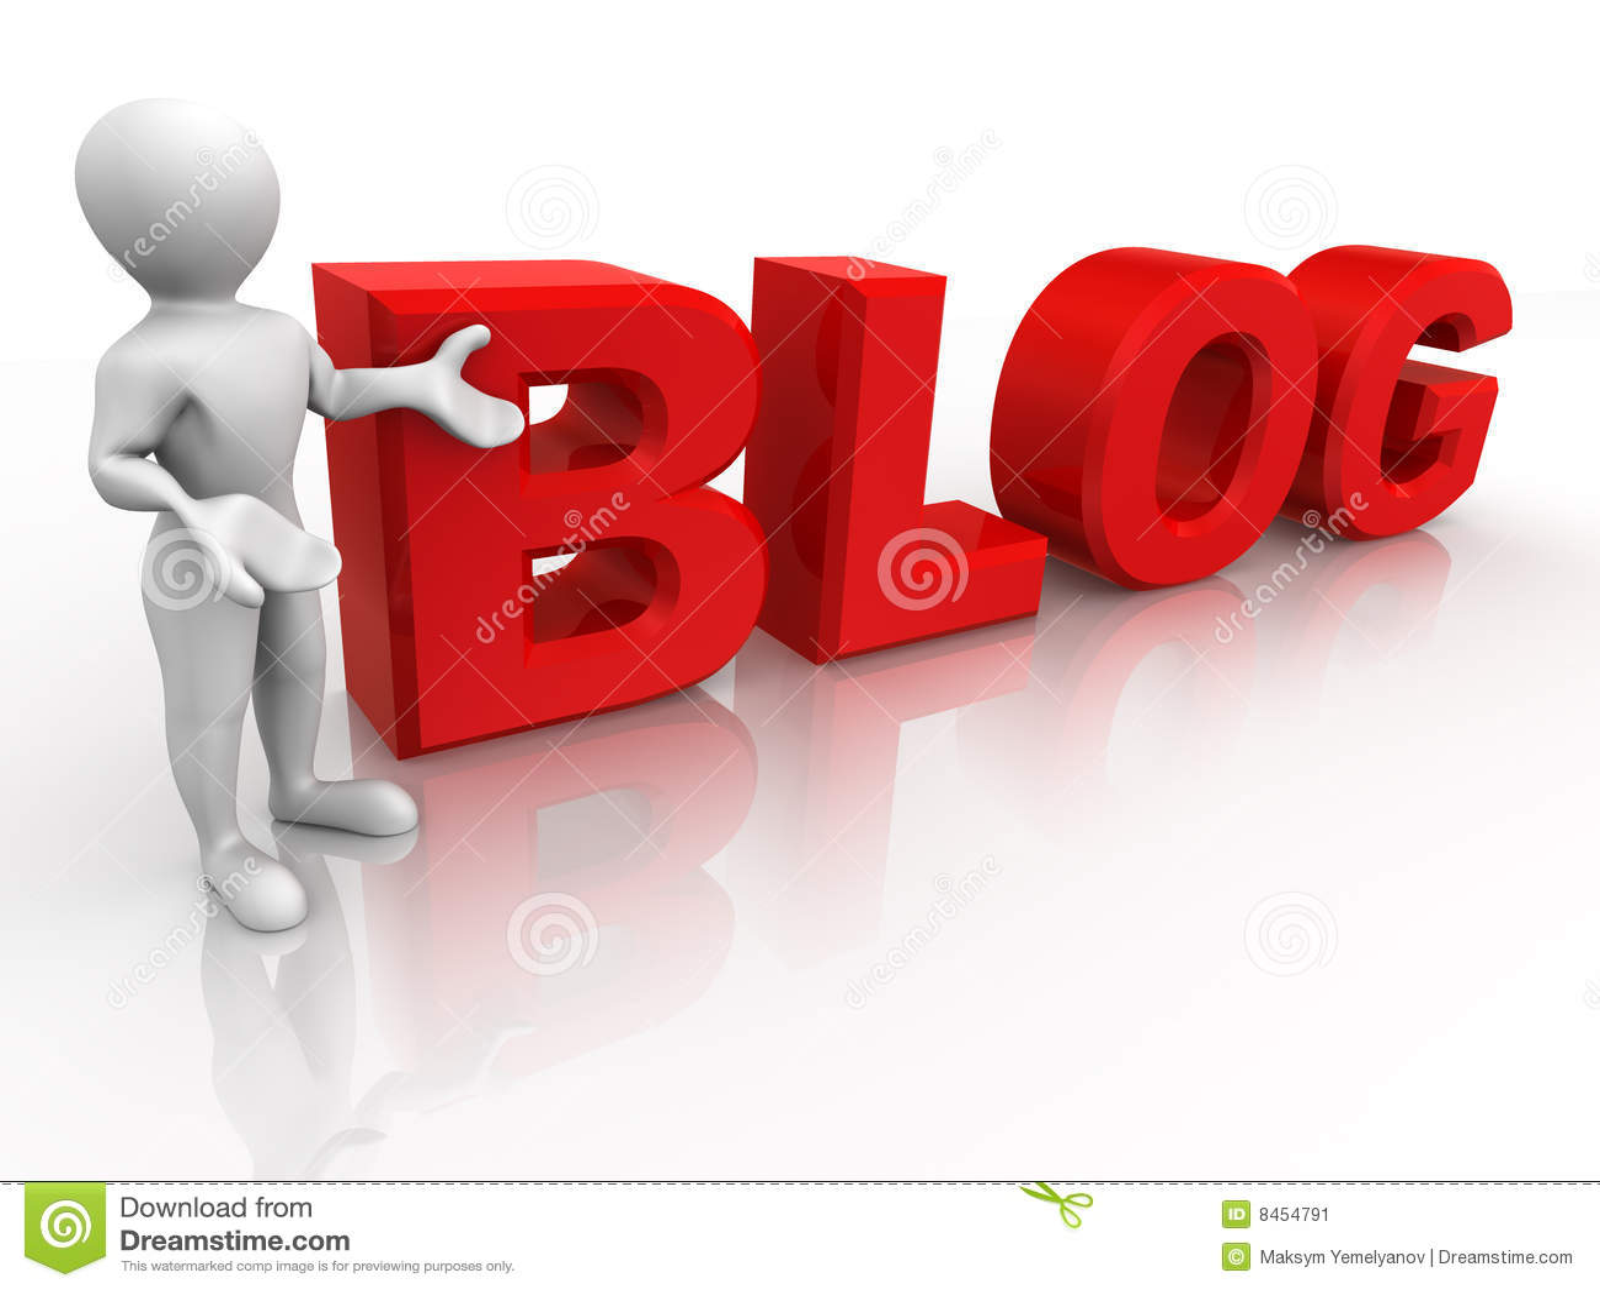 Blogmantext